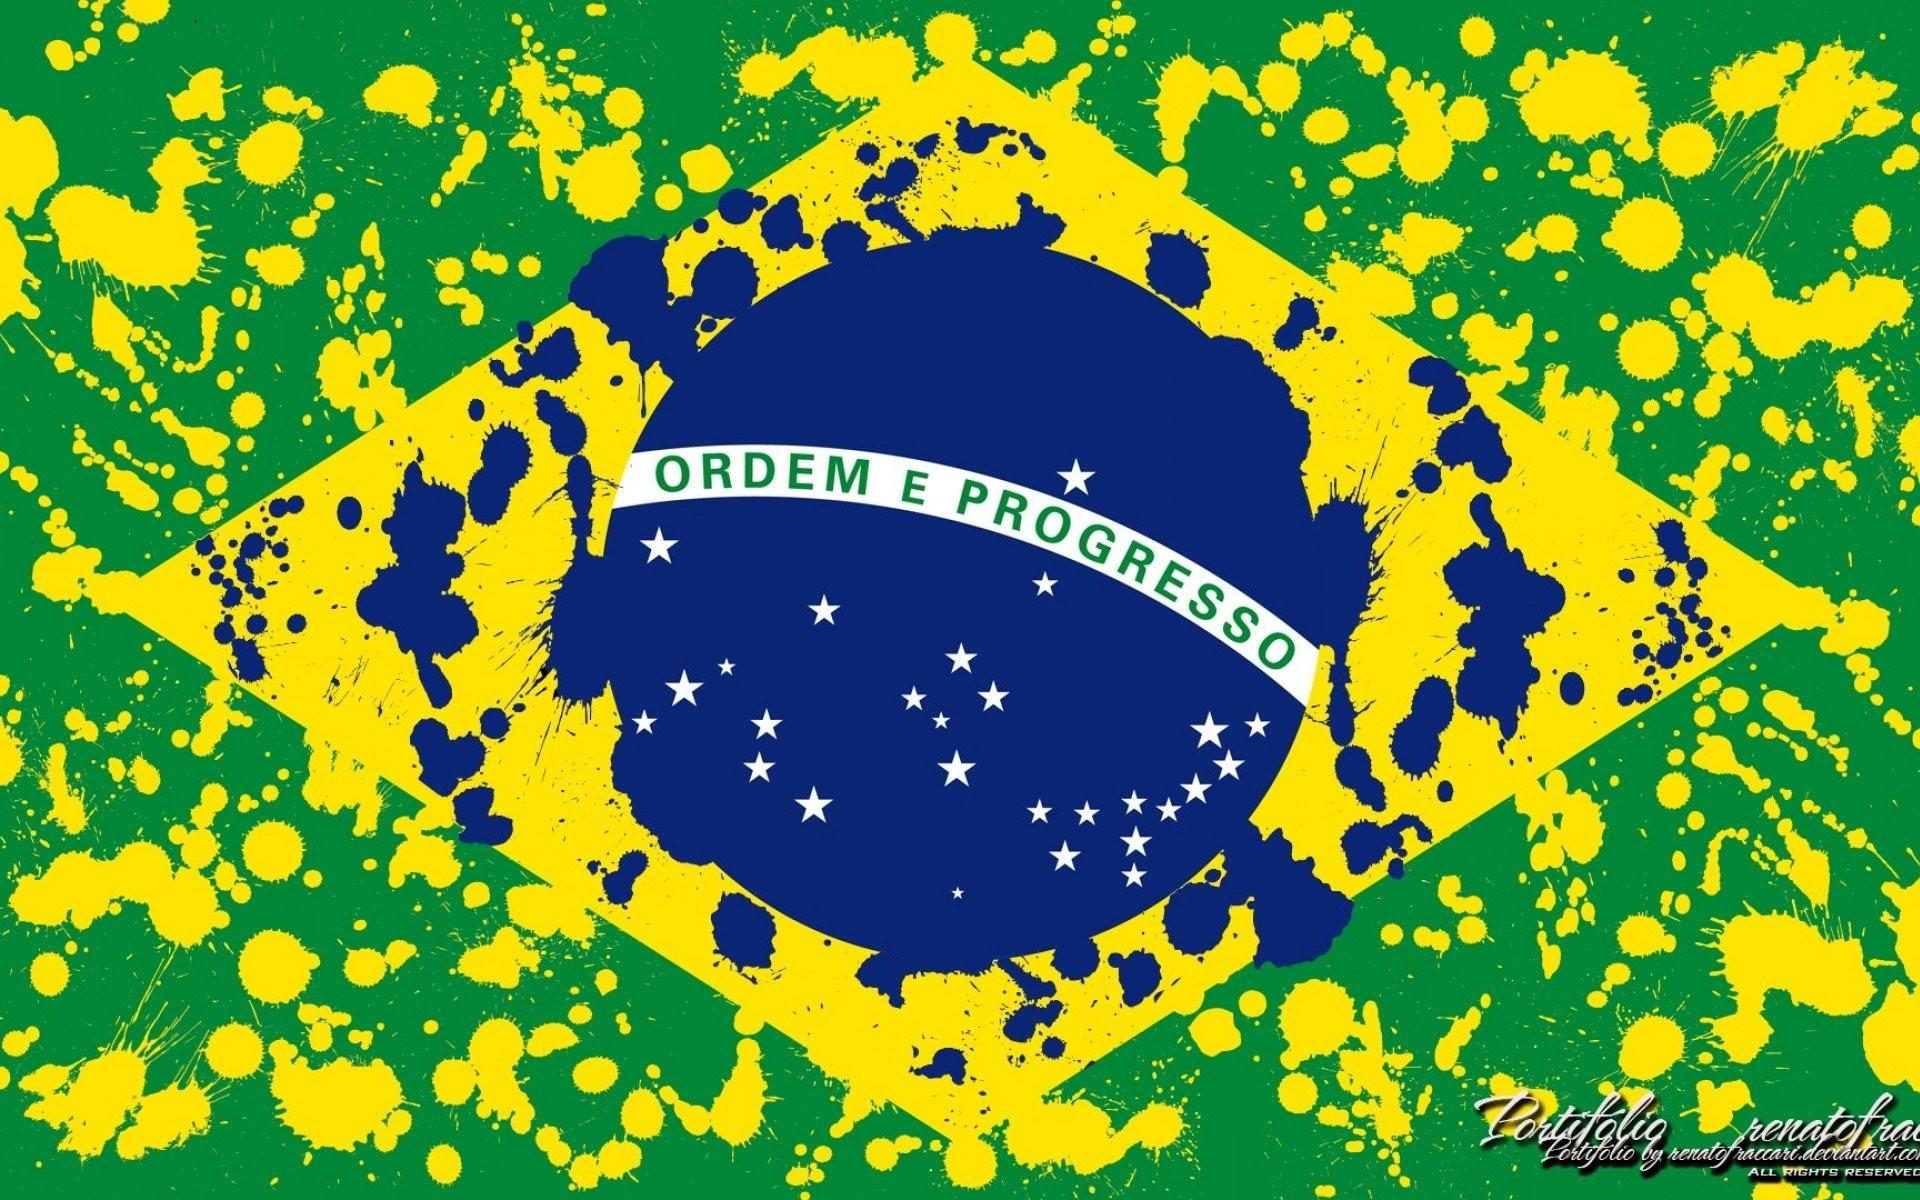 ZR26: Brazil Flag Wallpapers, Brazil Flag Pics In High Quality, GG.YAN